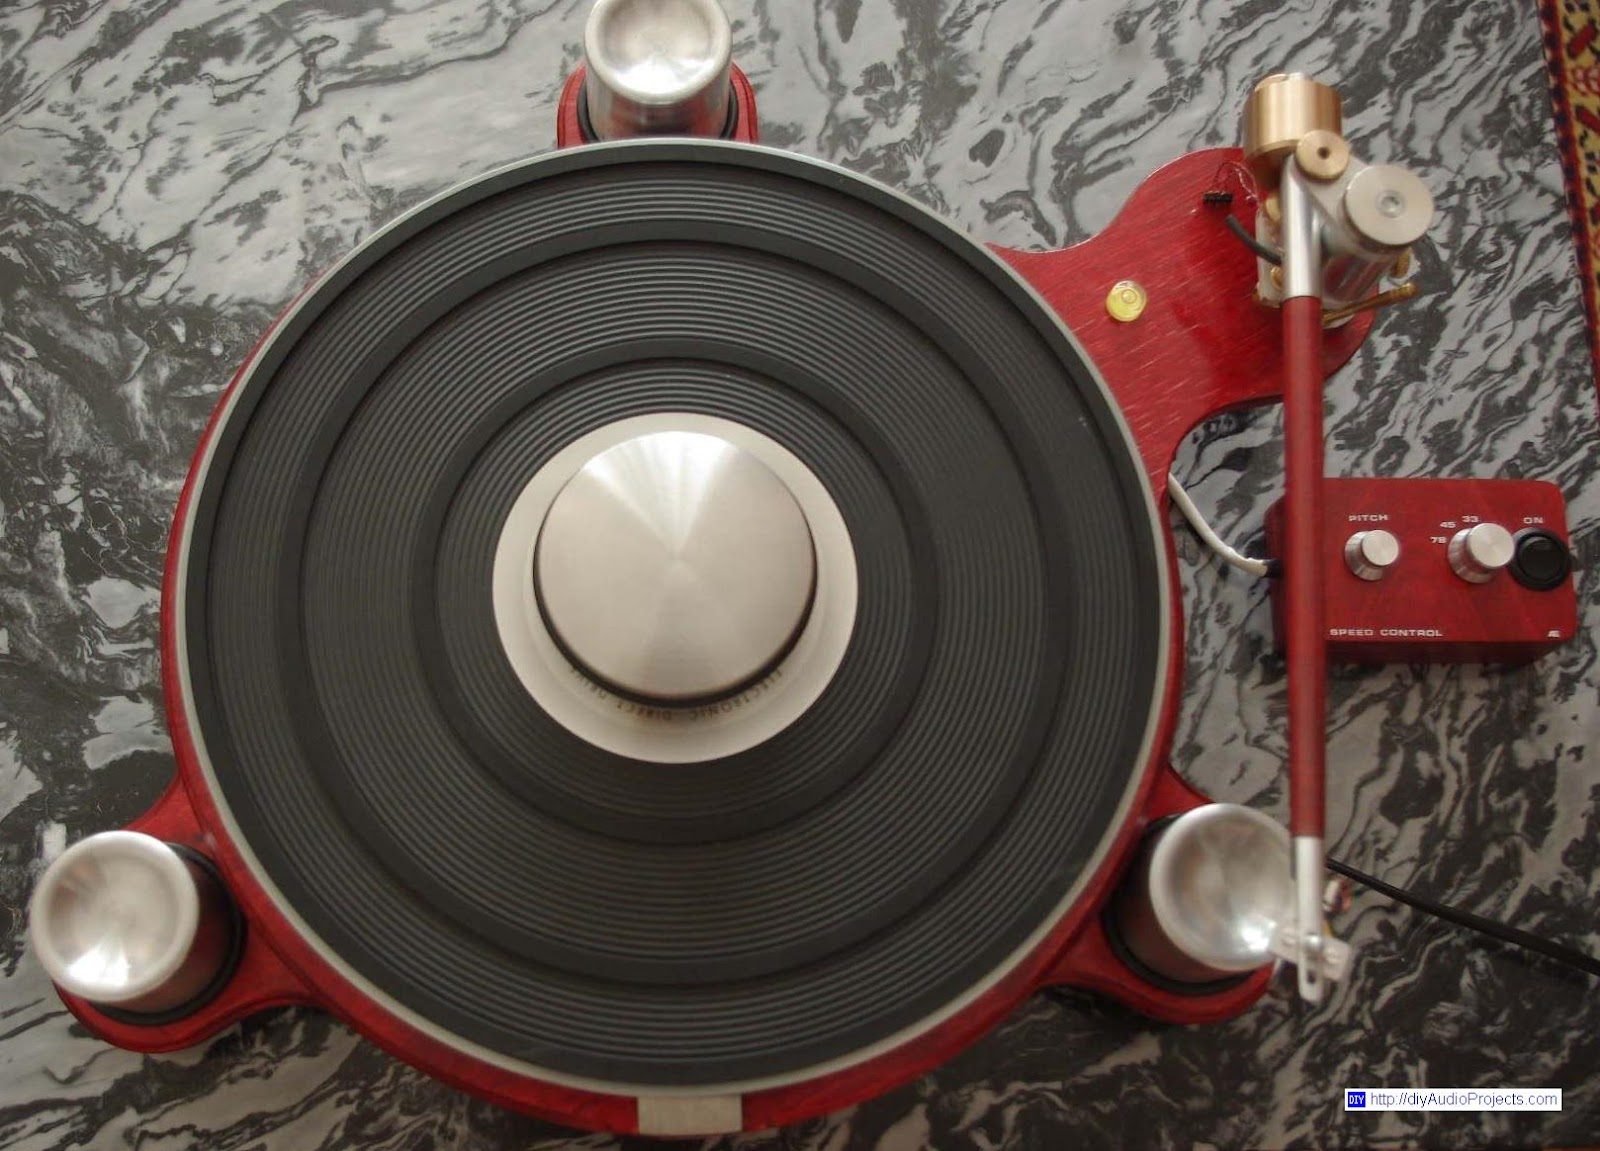 Diy Audio Projects Hi Fi Blog For Audiophiles Direct Hifi Grado Ra1 Headphone Amplifier Turntable